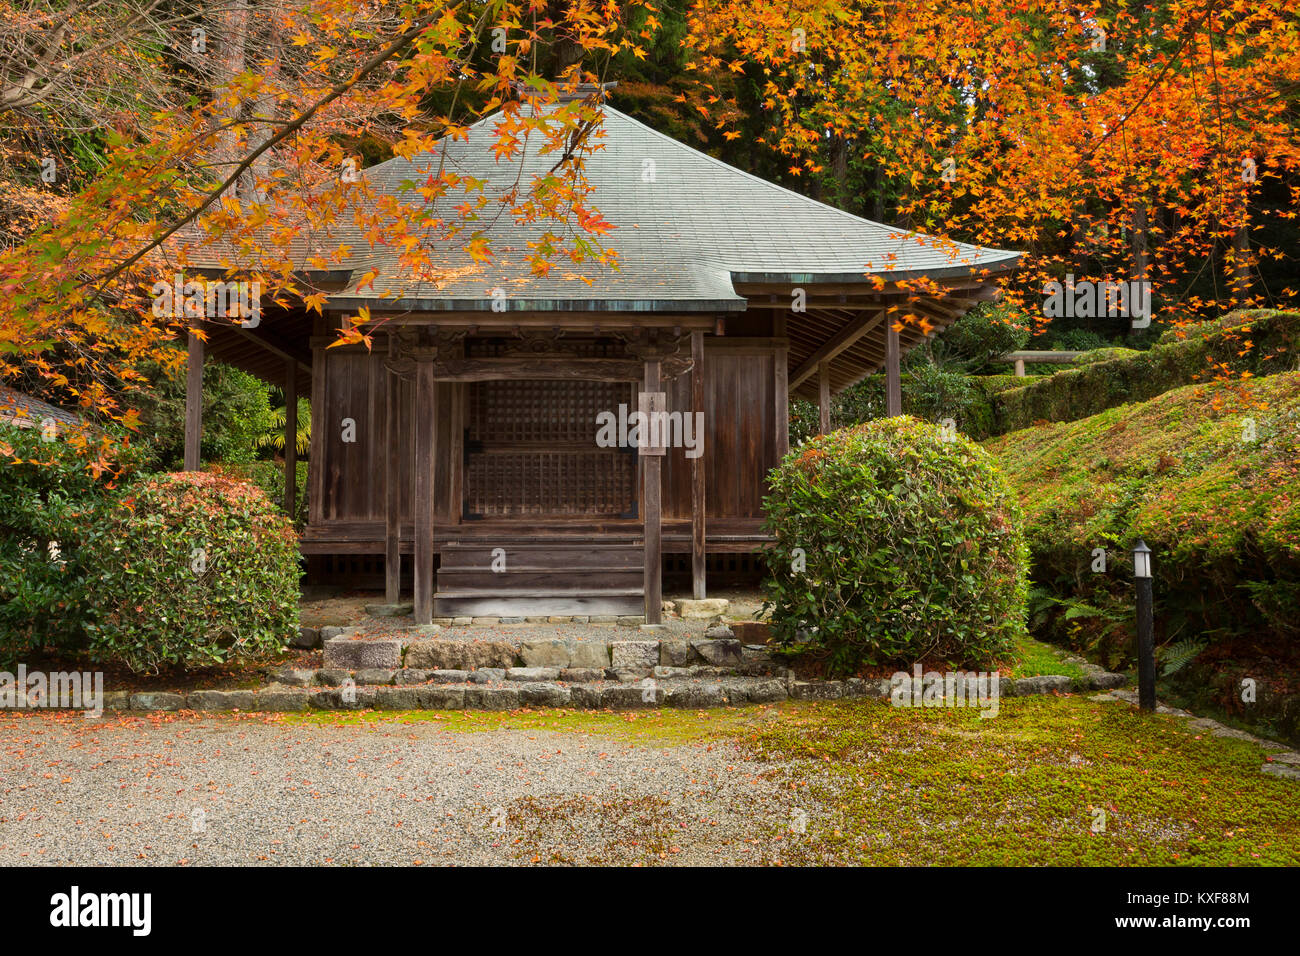 Fall leaves drape over a shrine in Ohara, Japan. - Stock Image